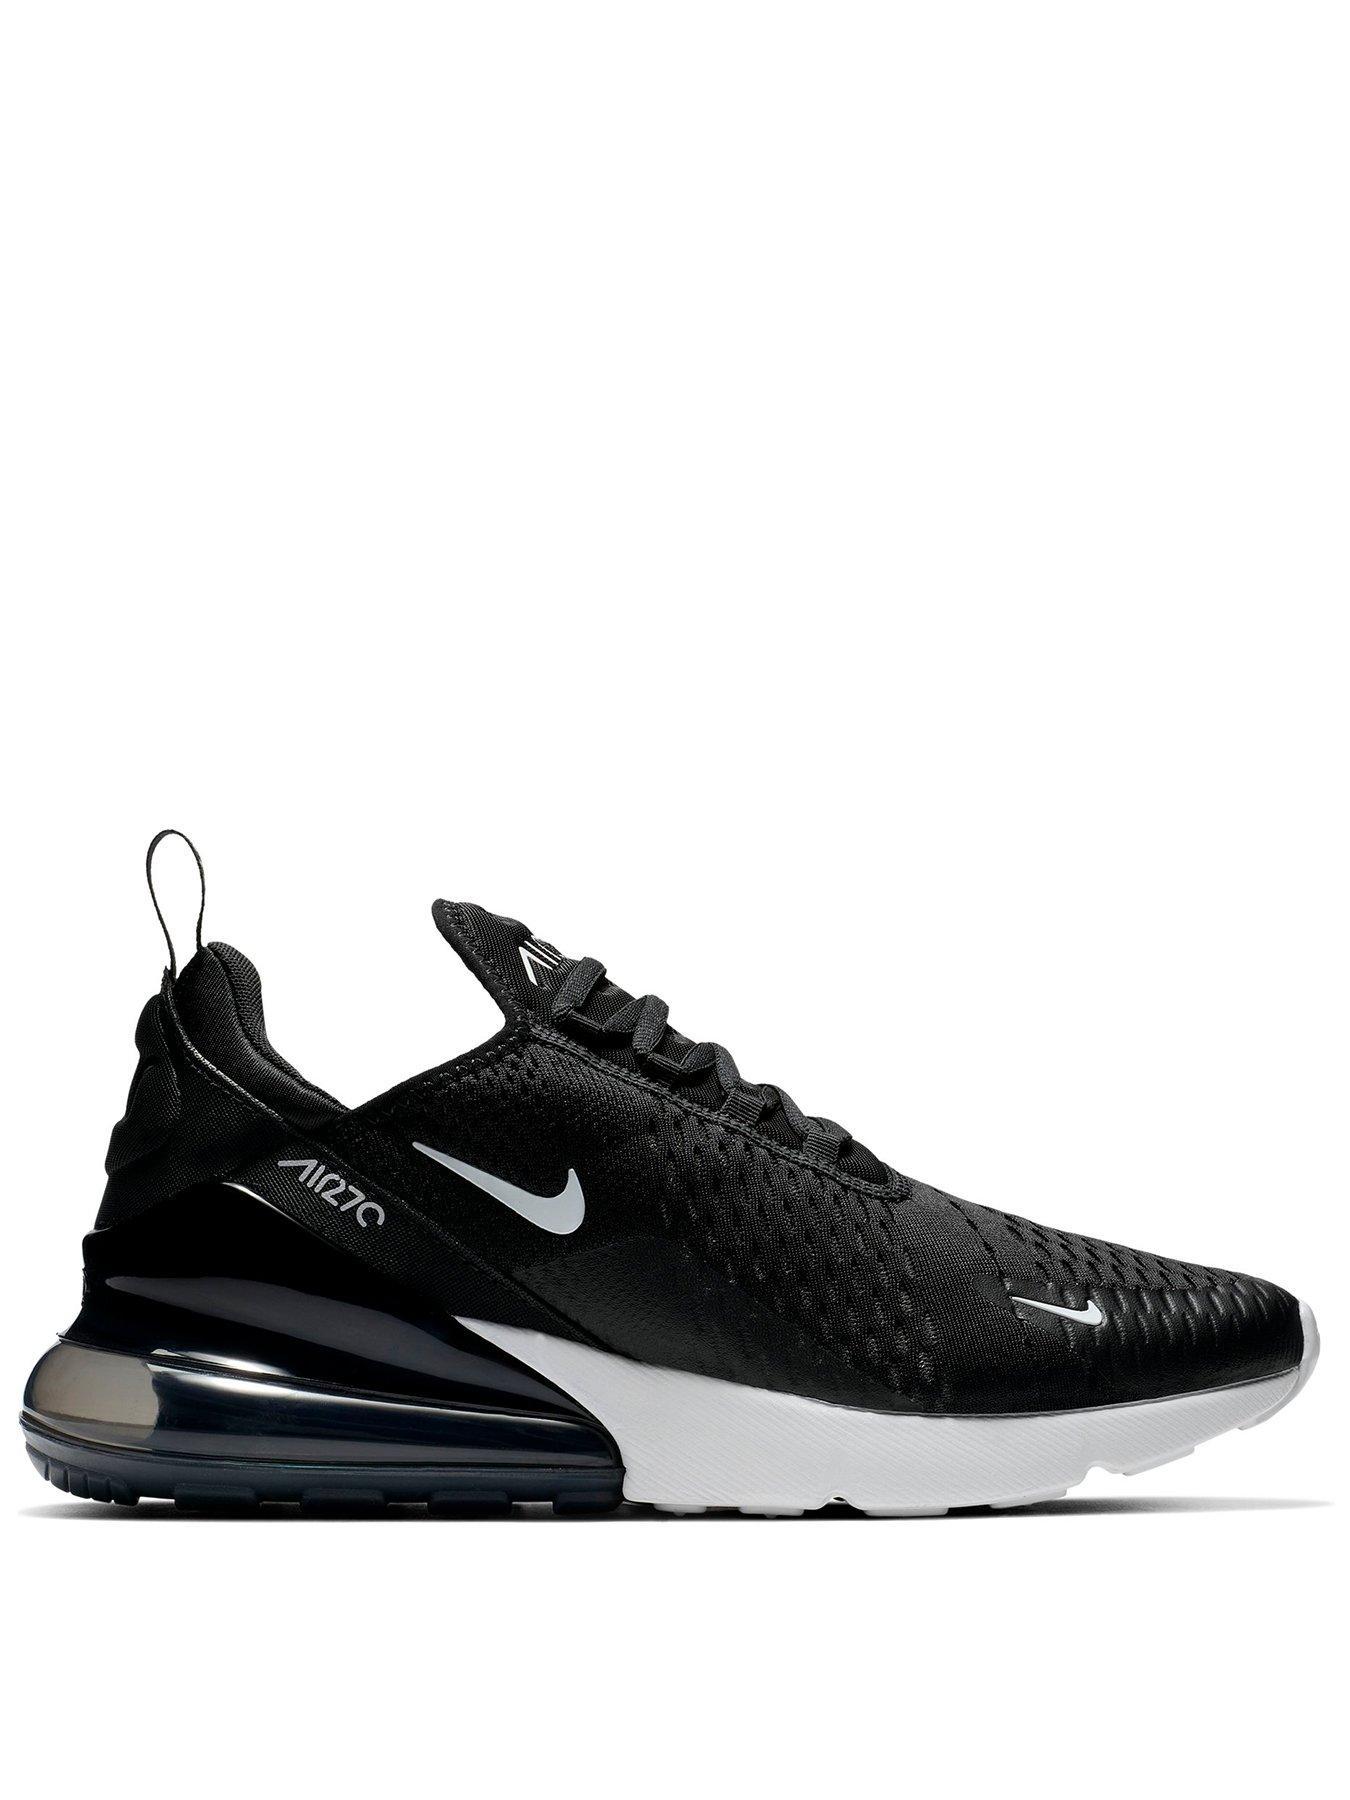 Nike Air Max 270   Womens trainers